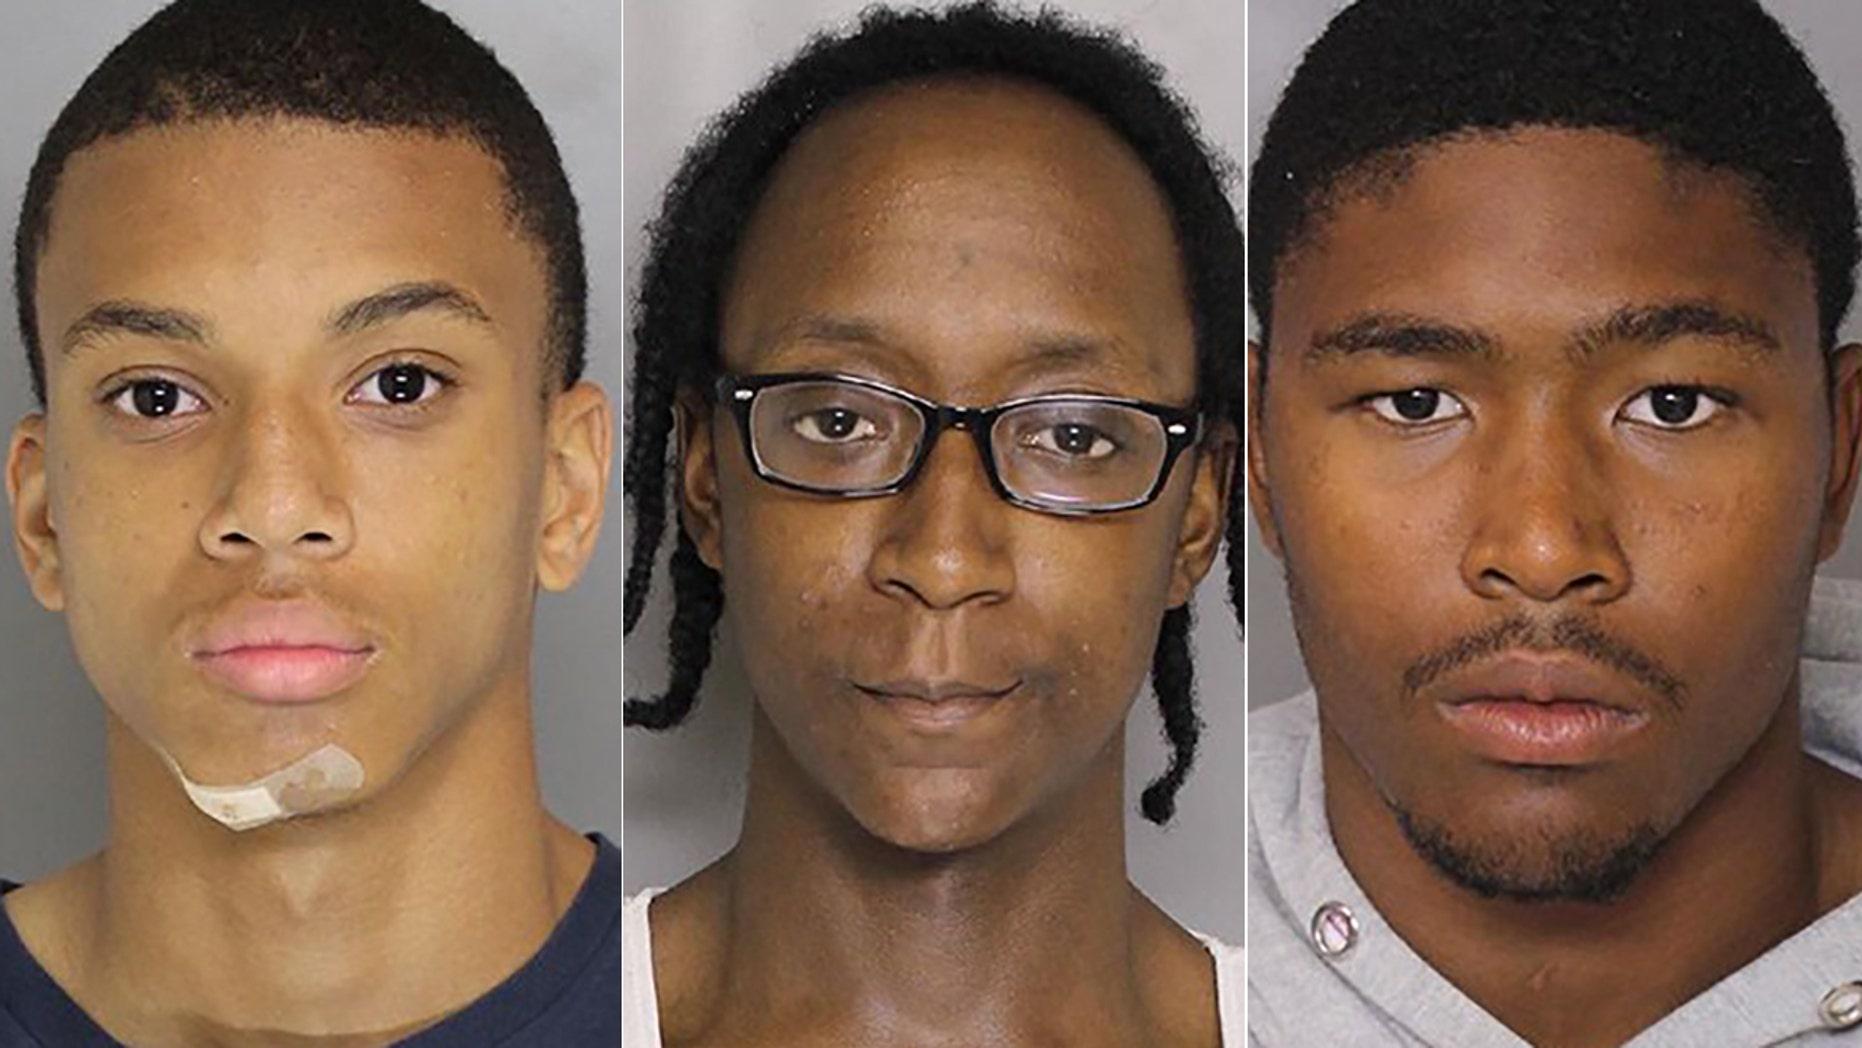 Eugene Robert Genius, Derrick Eugene Matthews and Darrell Jaymar Ward were charged with murder.